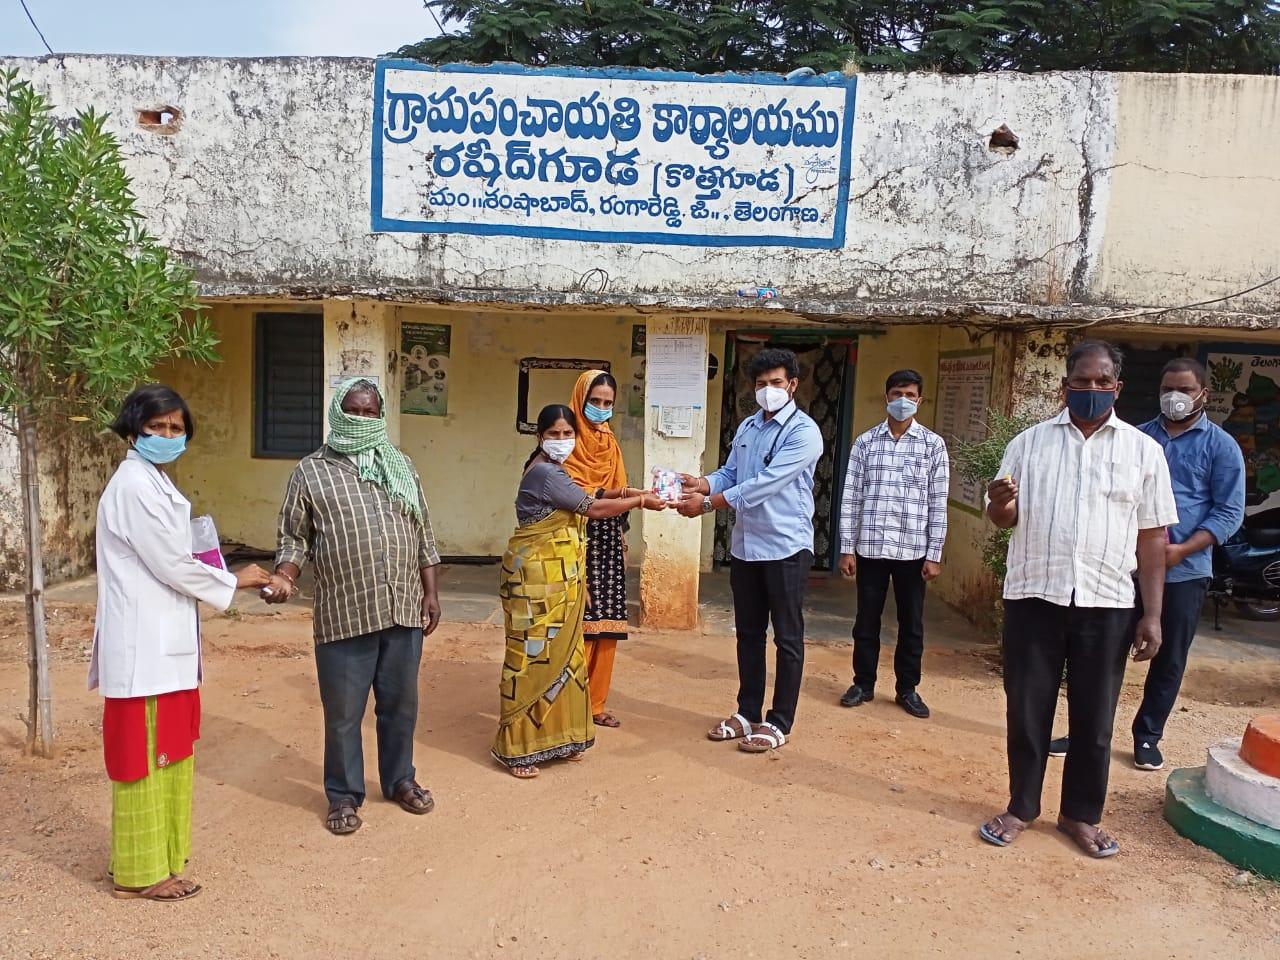 Janandolan Campaign On COVID 19 – Rally & Medicine distribution programme at Rasheedguda & Poshettiguda of Shamshabad Mandal.